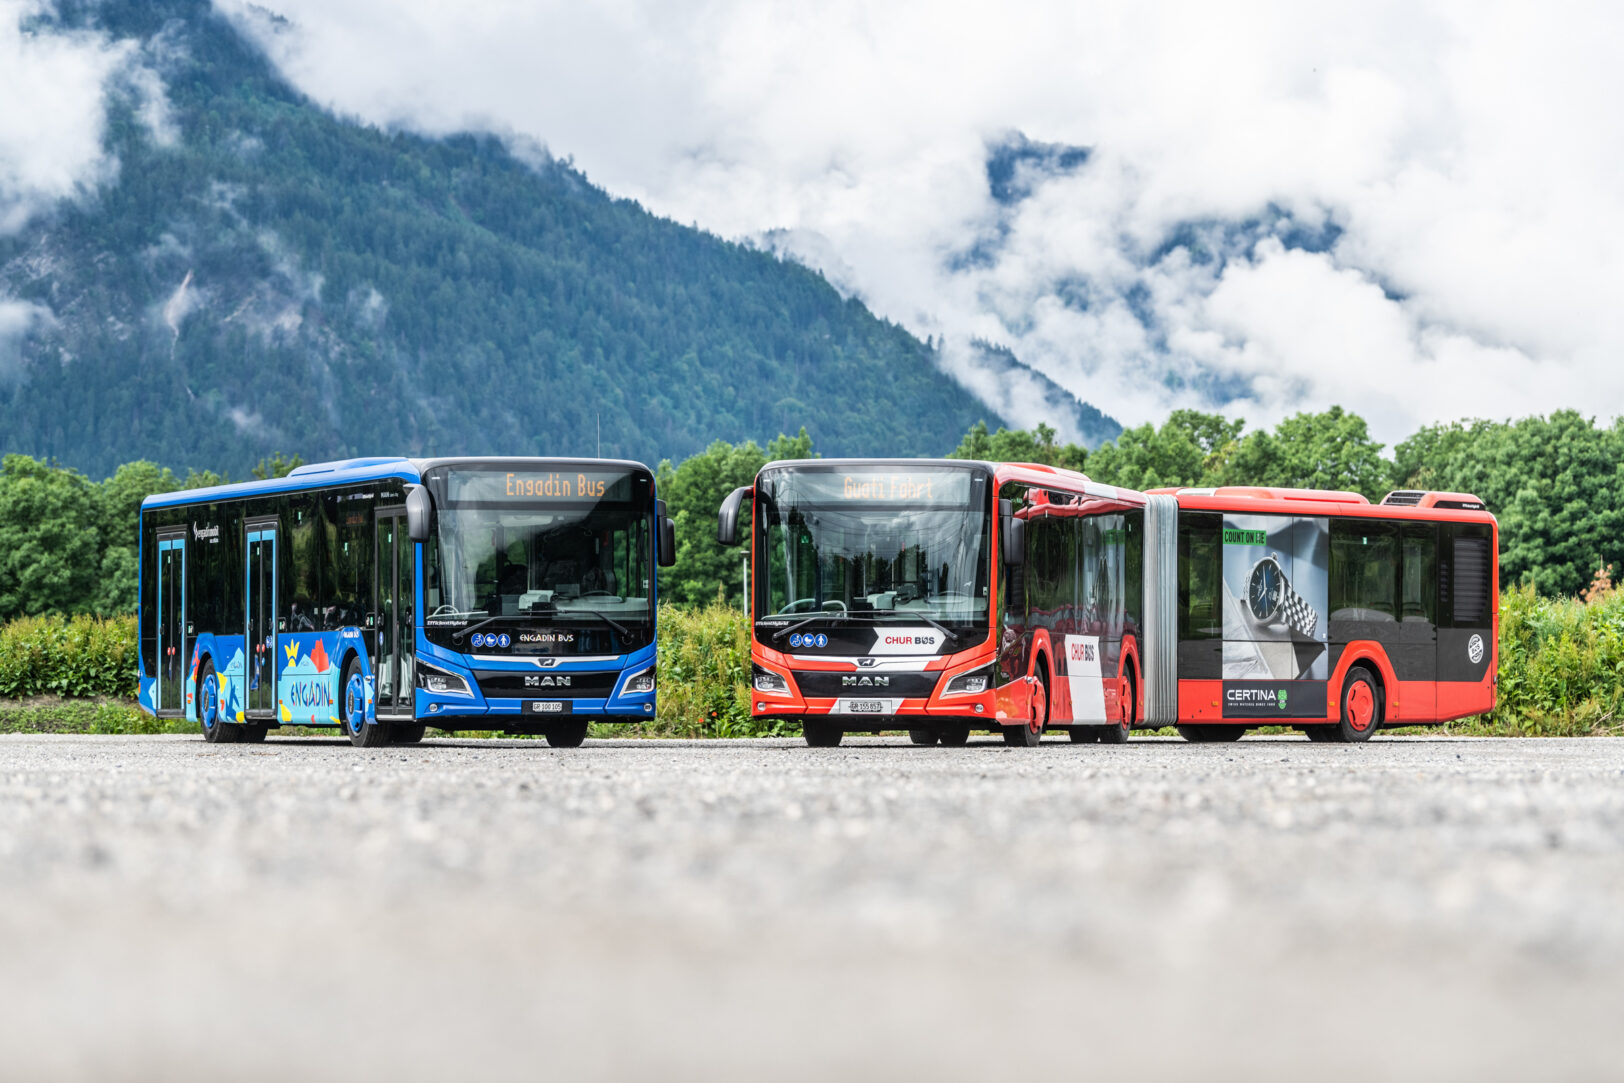 Engadin Bus und Chur Bus